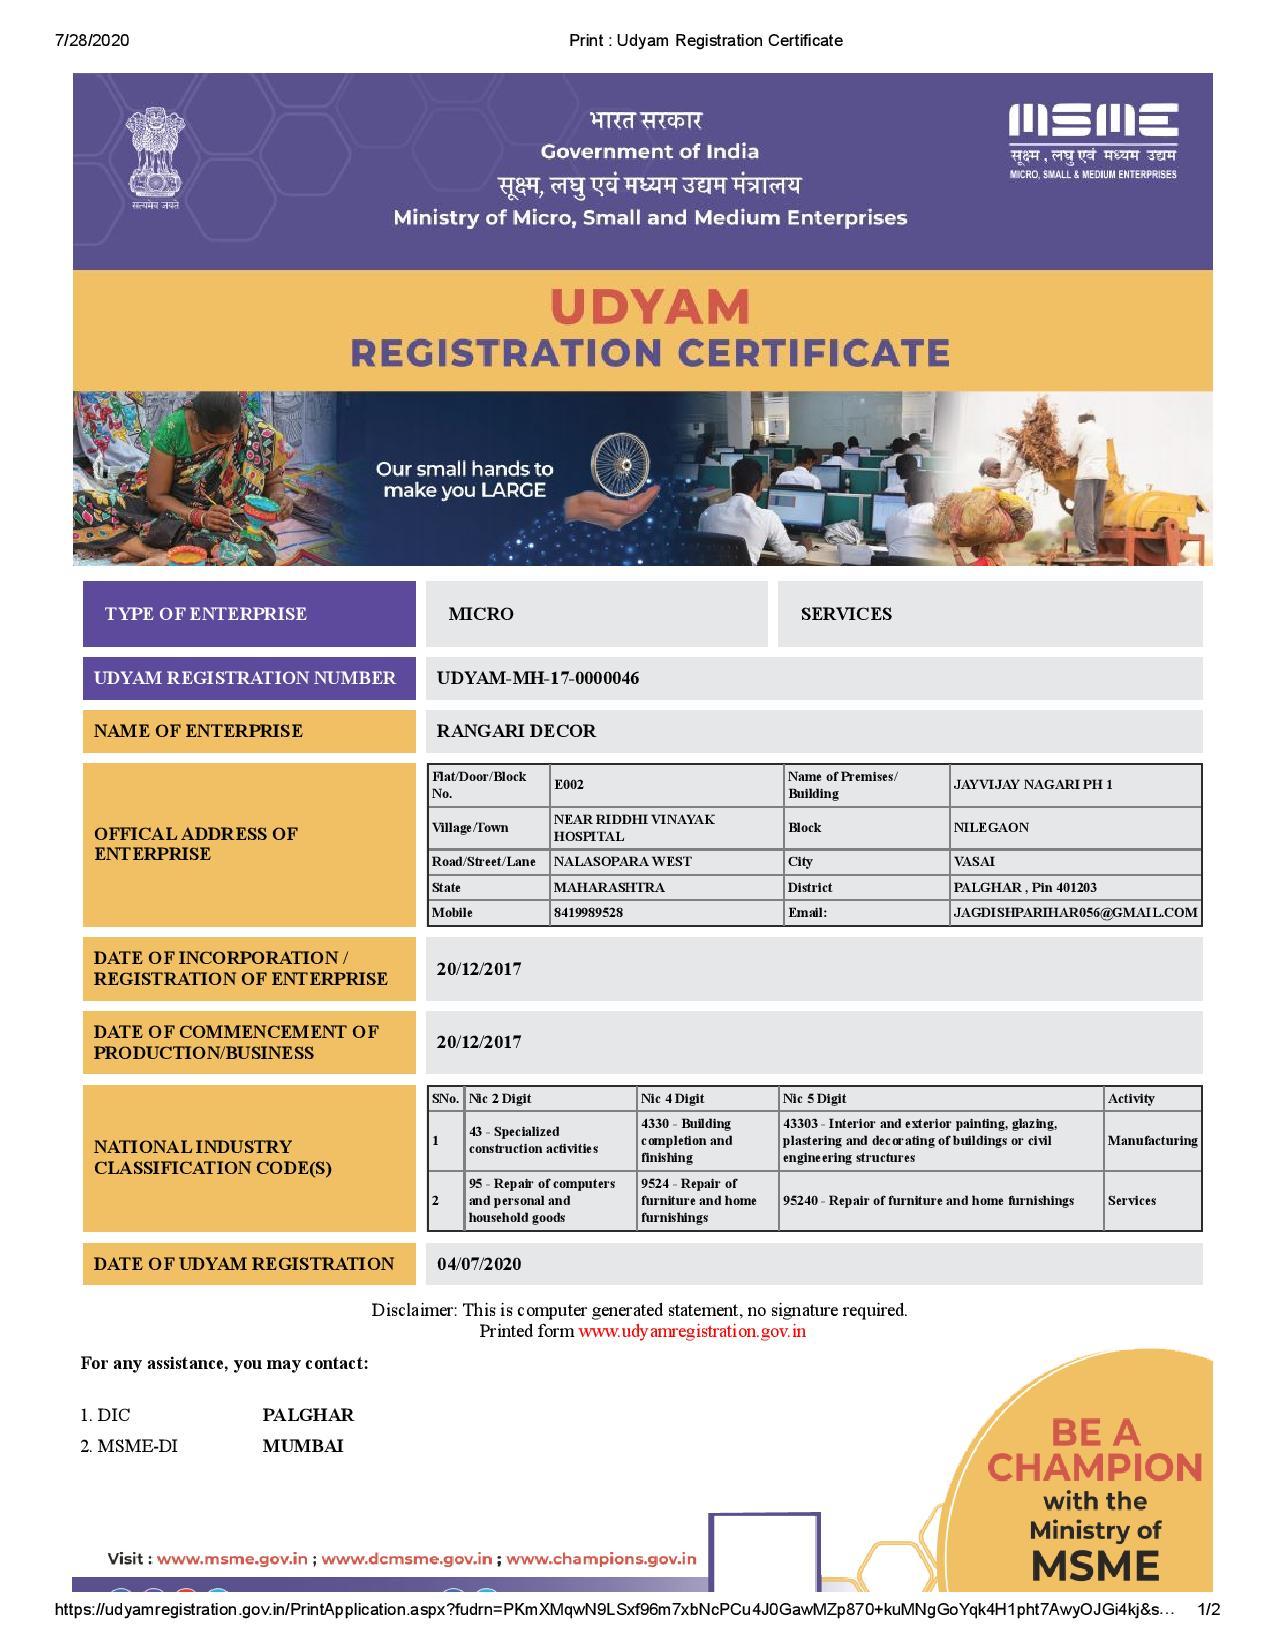 udyam-registration